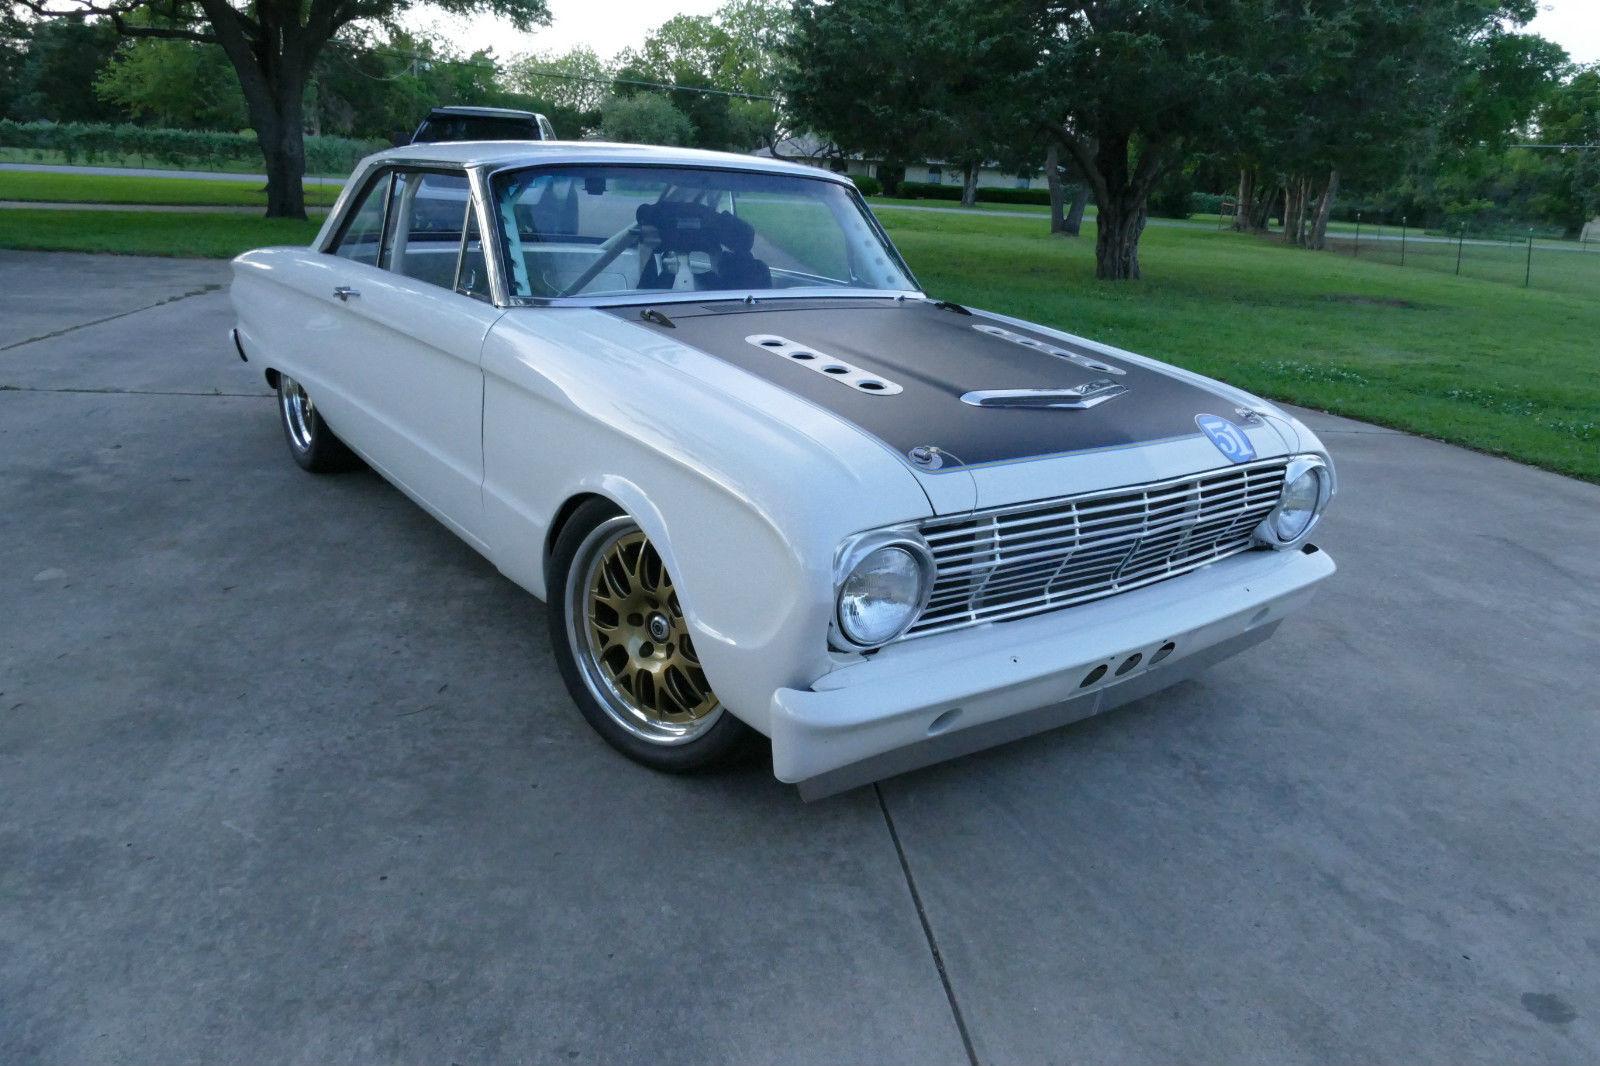 For Sale: Aaron Kaufman's 1963 Falcon Race Car – Engine Swap